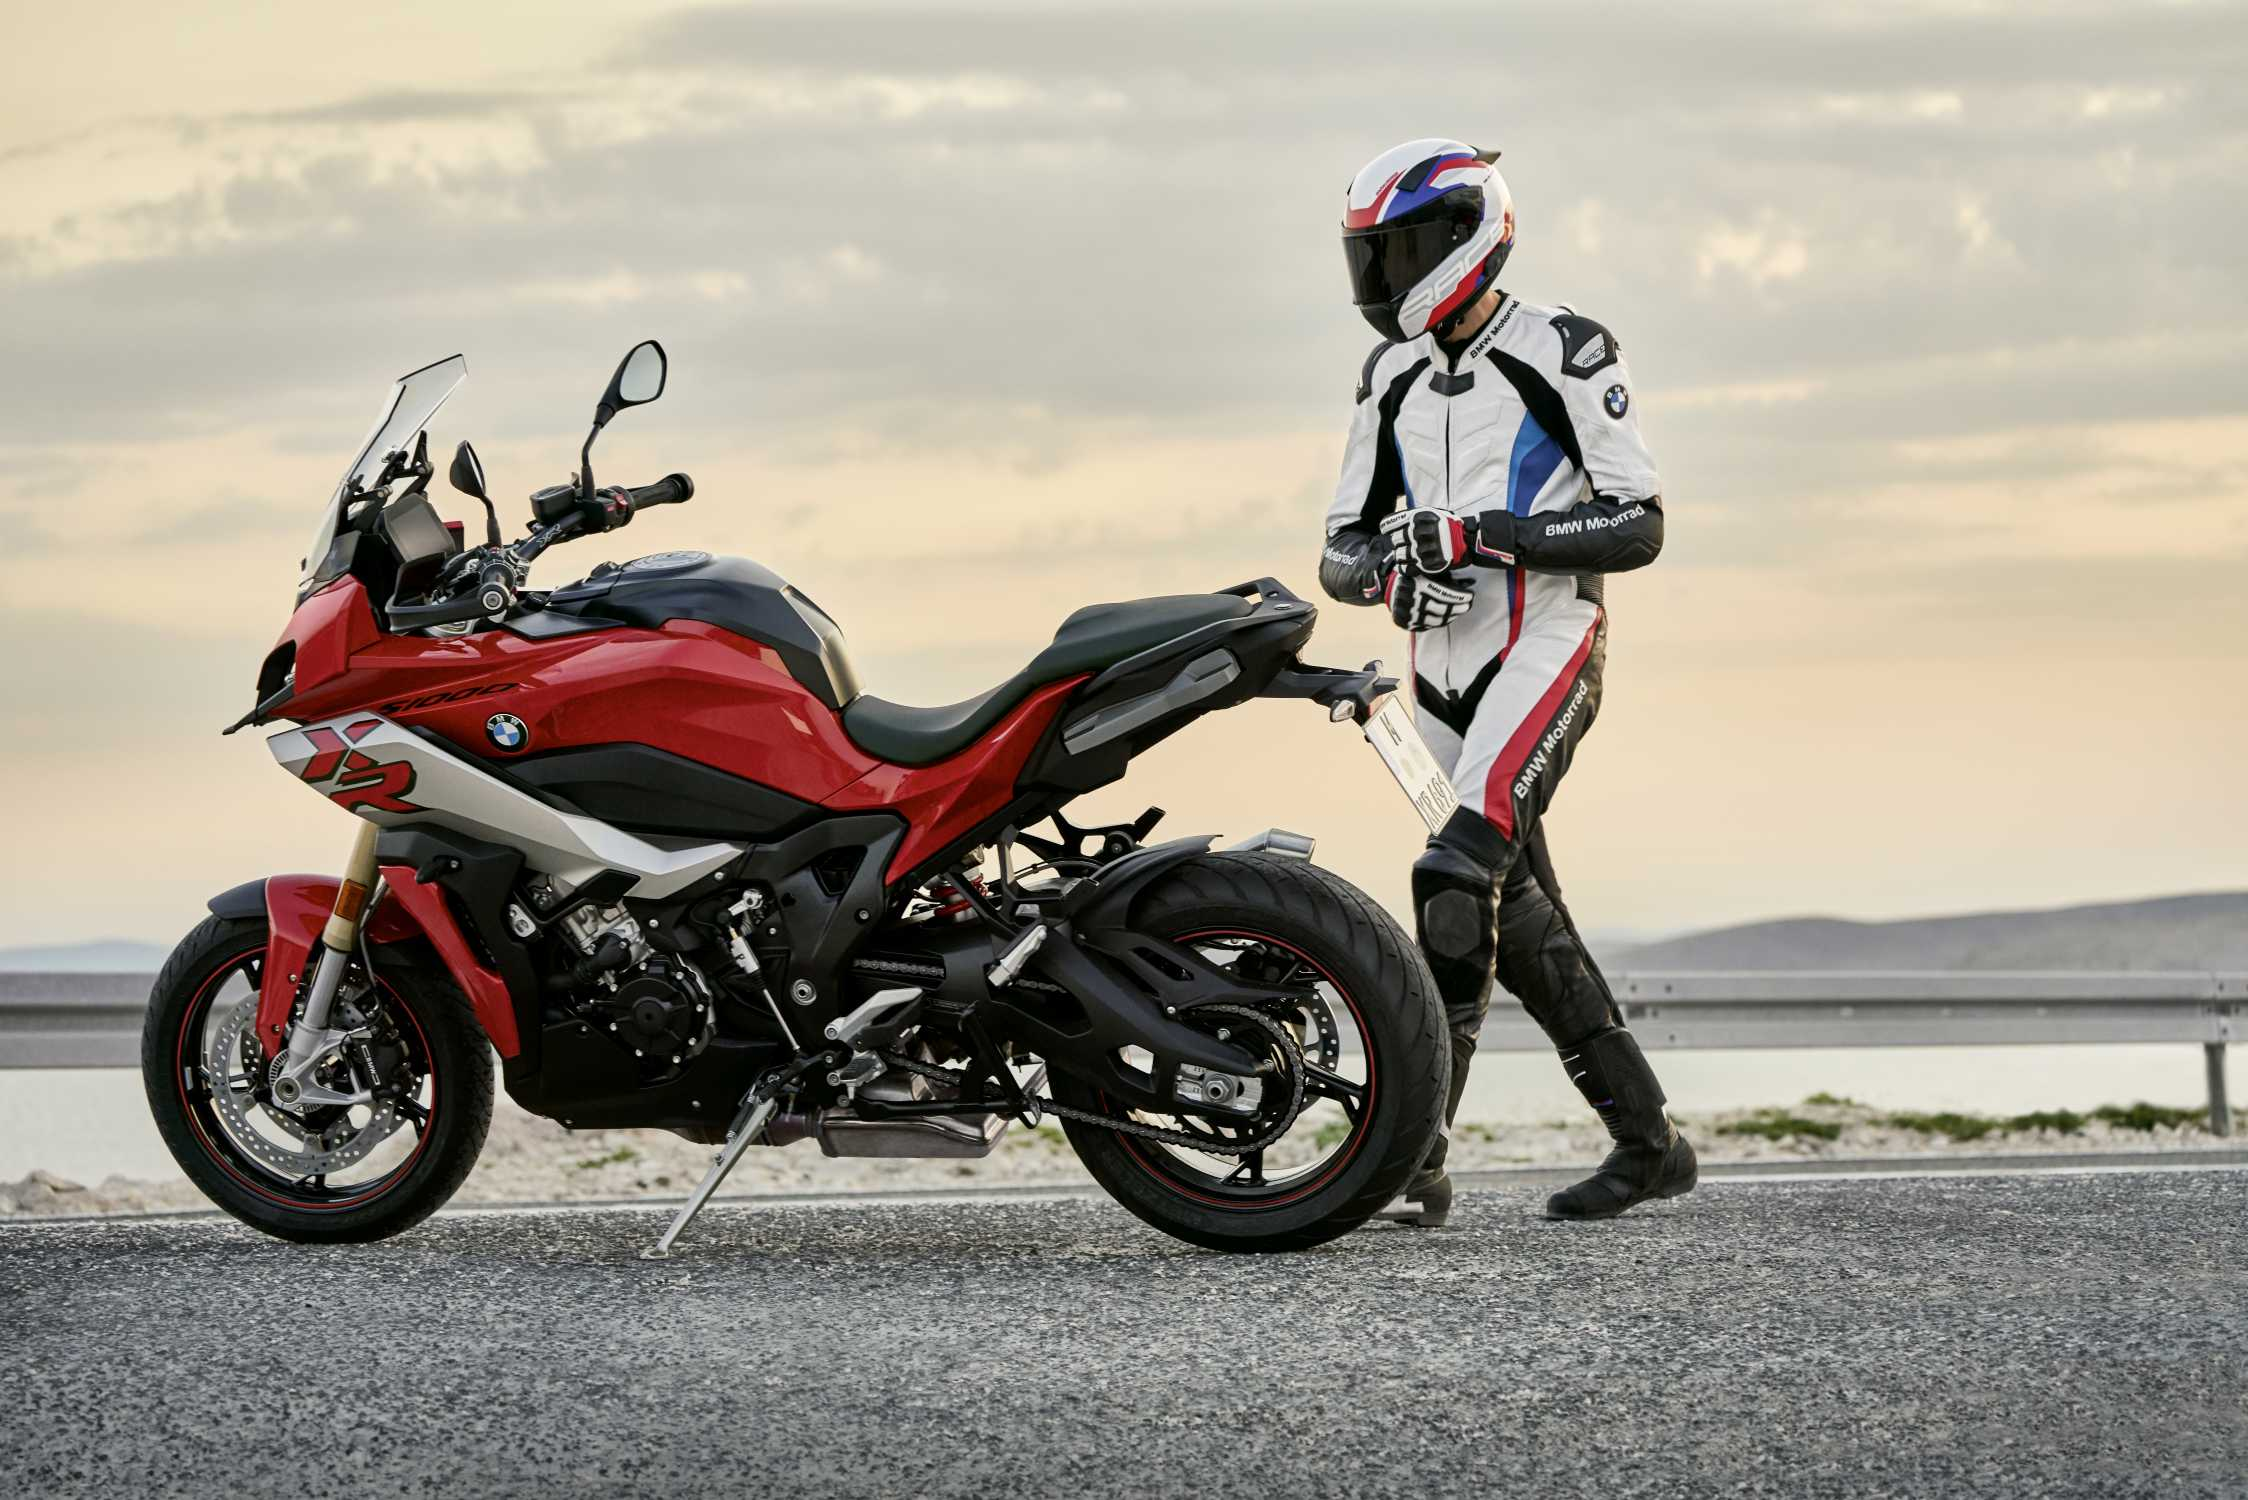 Bmw Motorrad Style 2020 Fahrerausstattung Rideamp; n8P0wOk